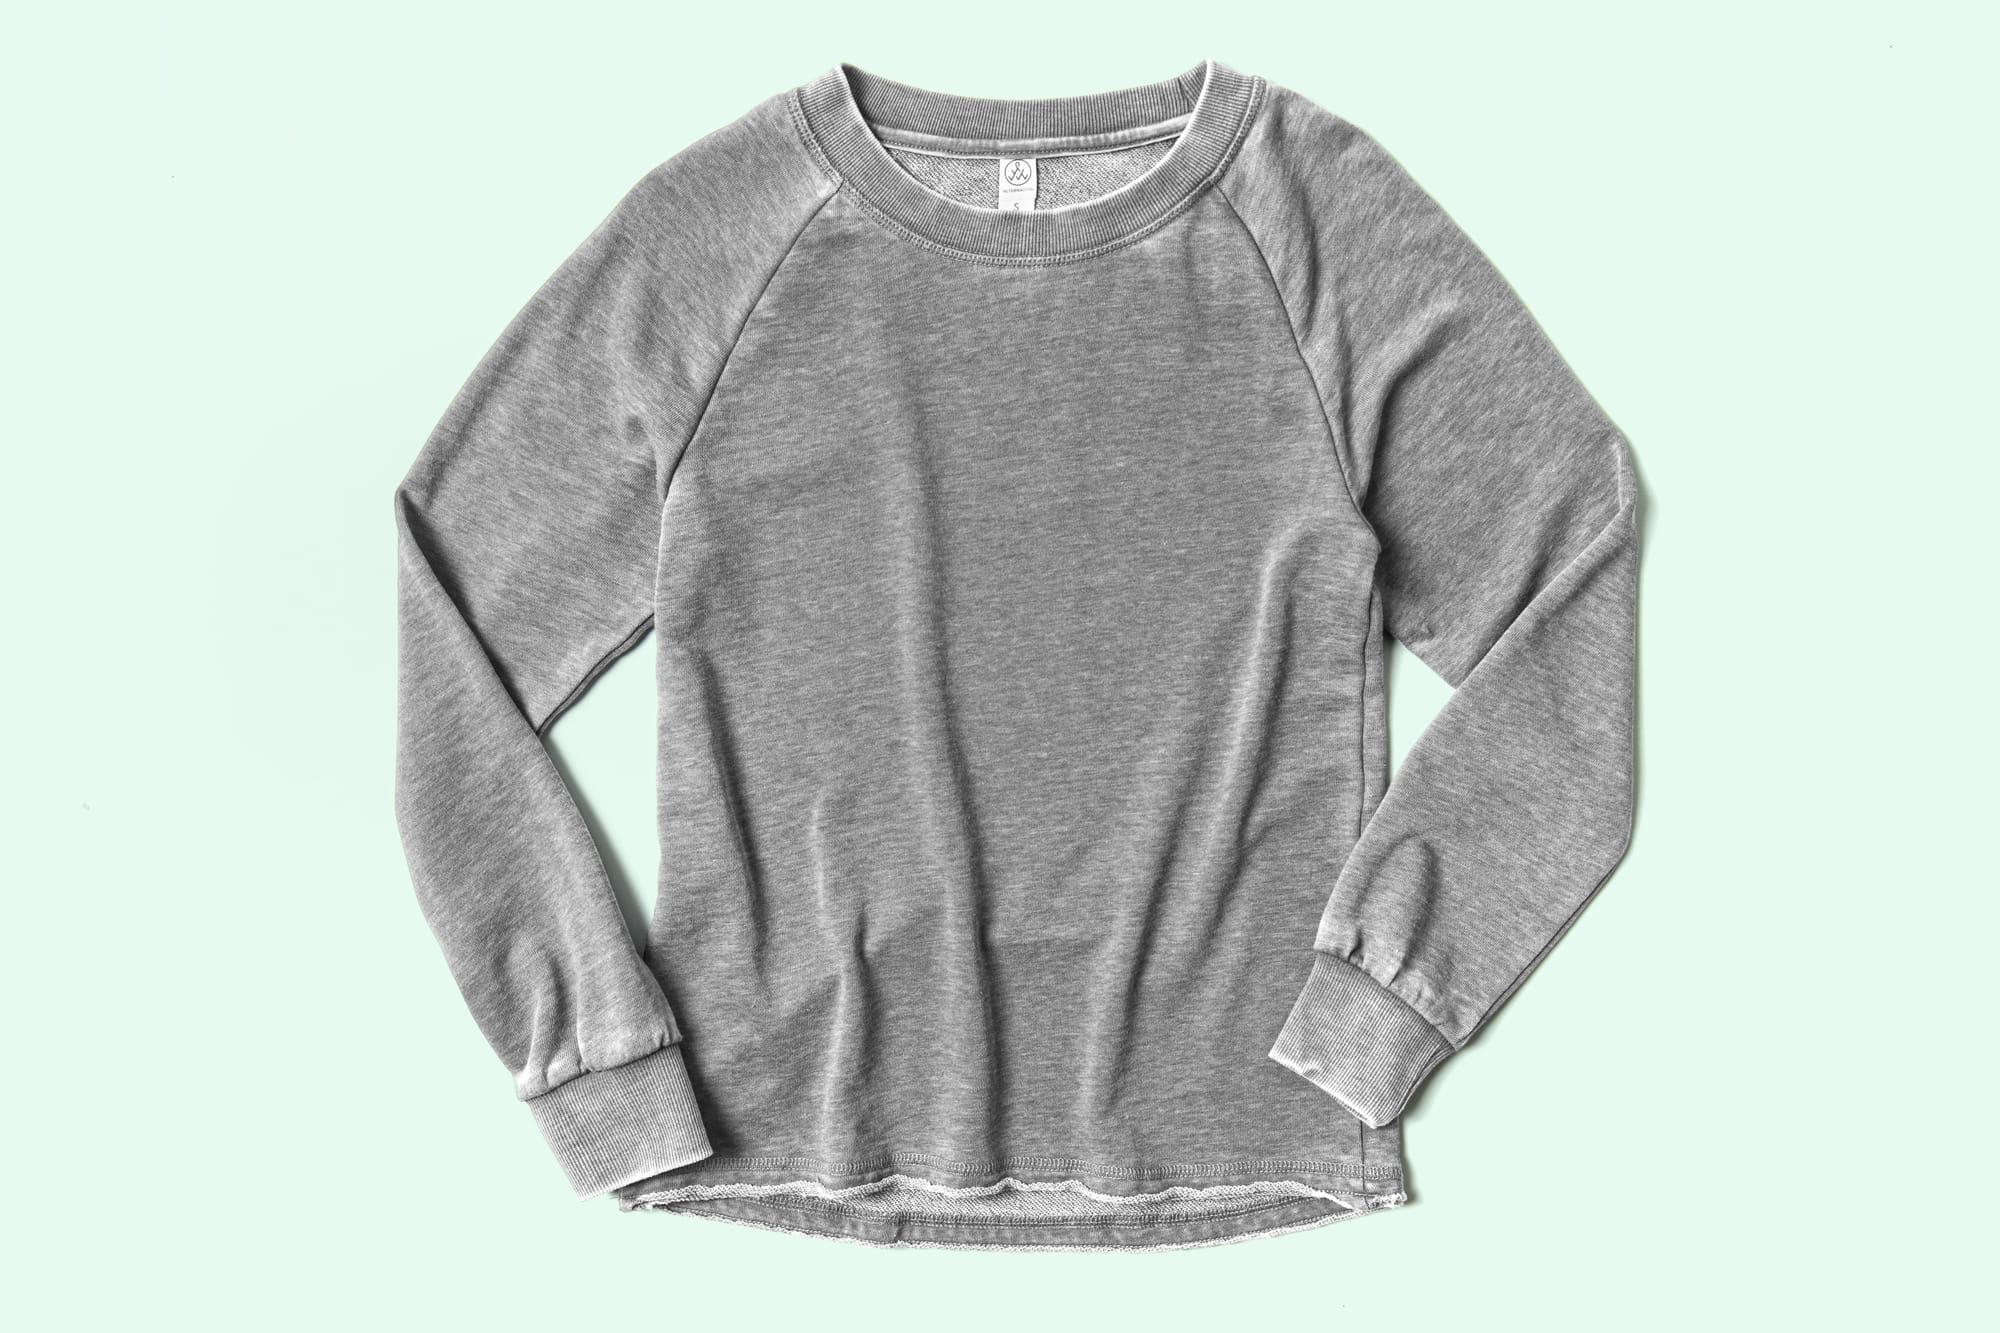 Image of the Ladies Burnout Sweatshirt.